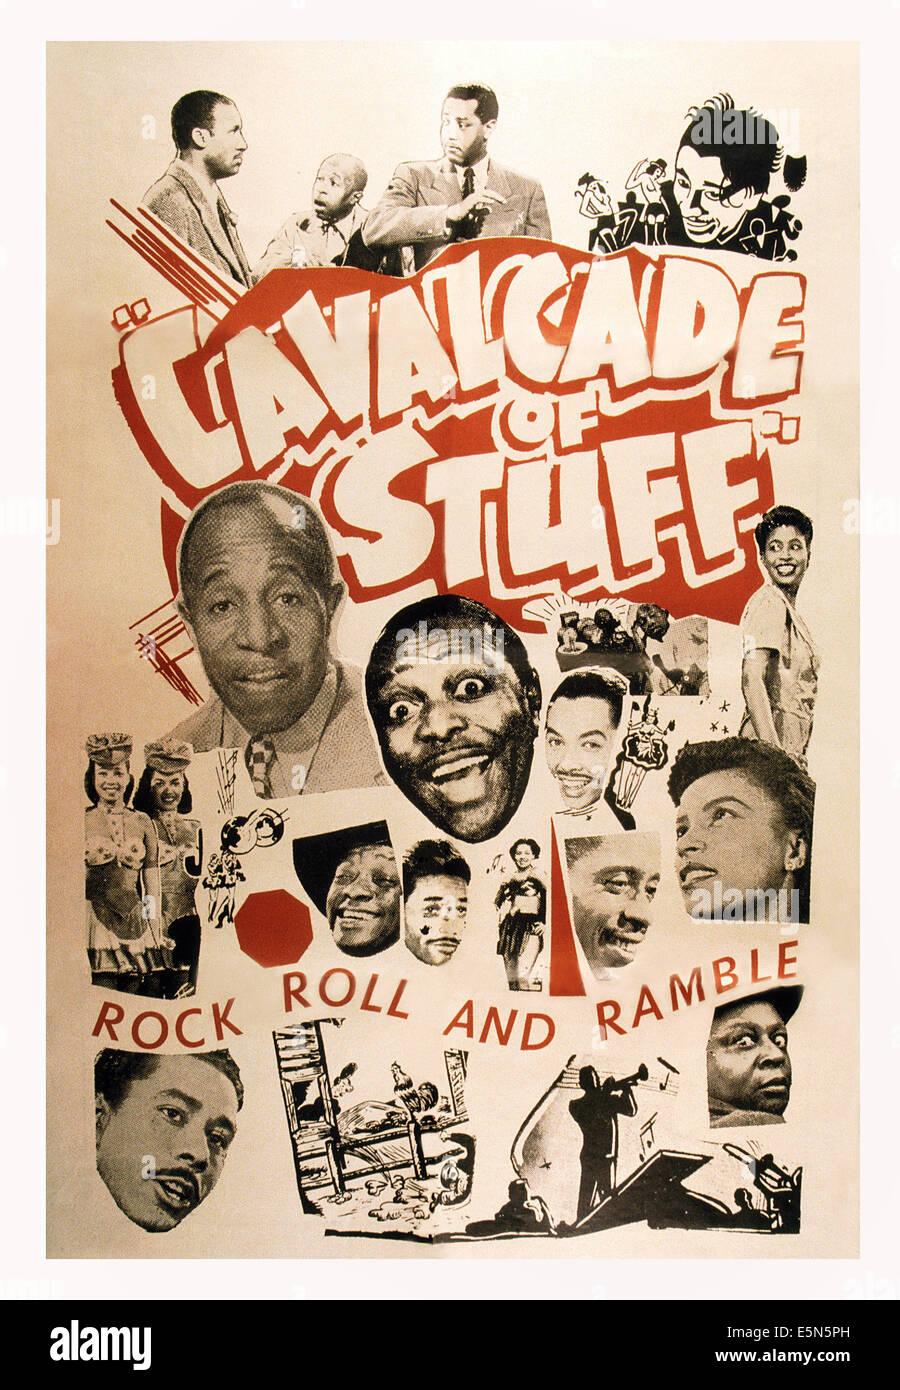 Kavalkade von Sachen, US-Plakat, Mantan Moreland (unten rechts), ca. Anfang der 1950er Jahre Stockbild